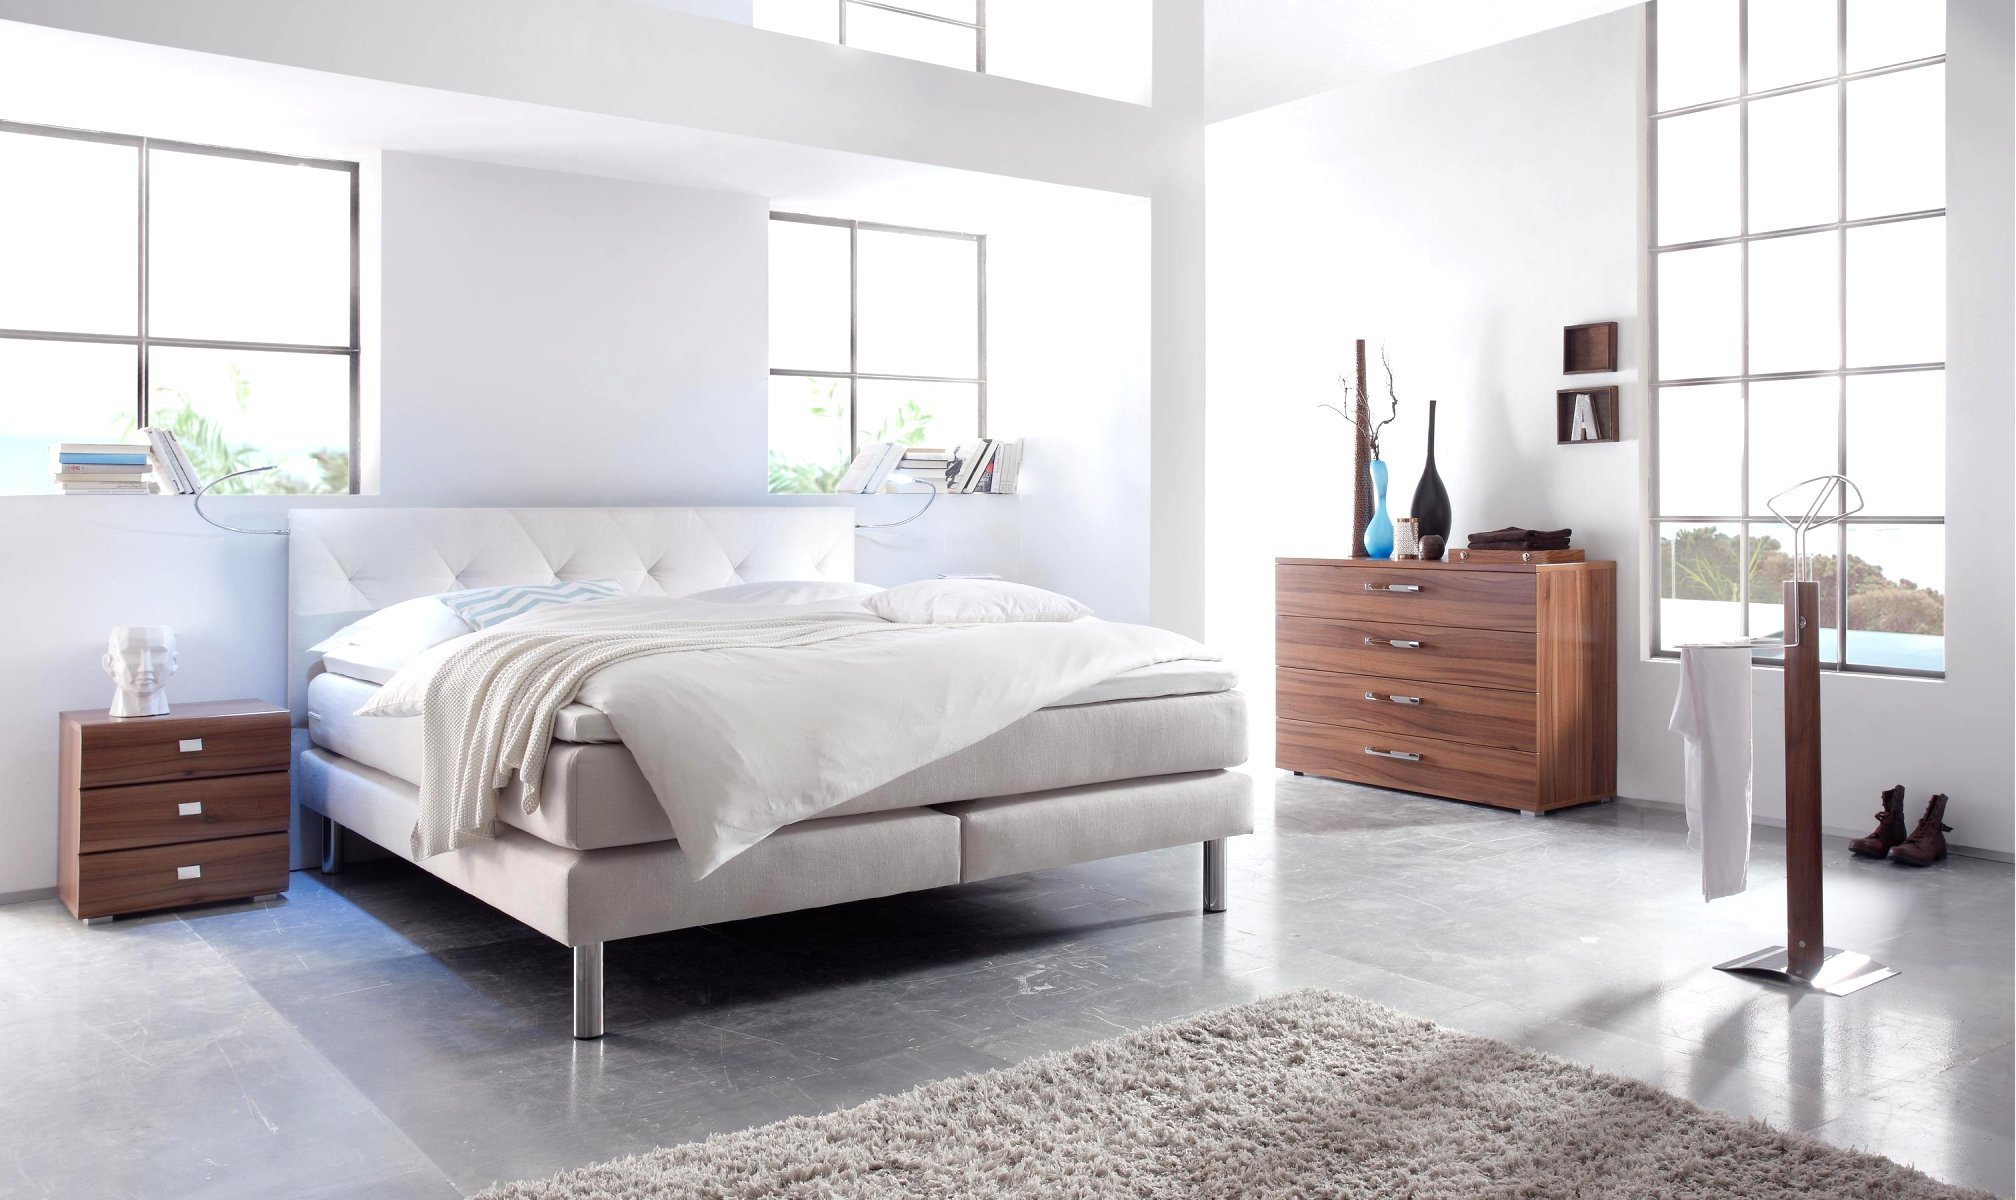 schlafzimmer boxspring moebelhuus zetzwil. Black Bedroom Furniture Sets. Home Design Ideas